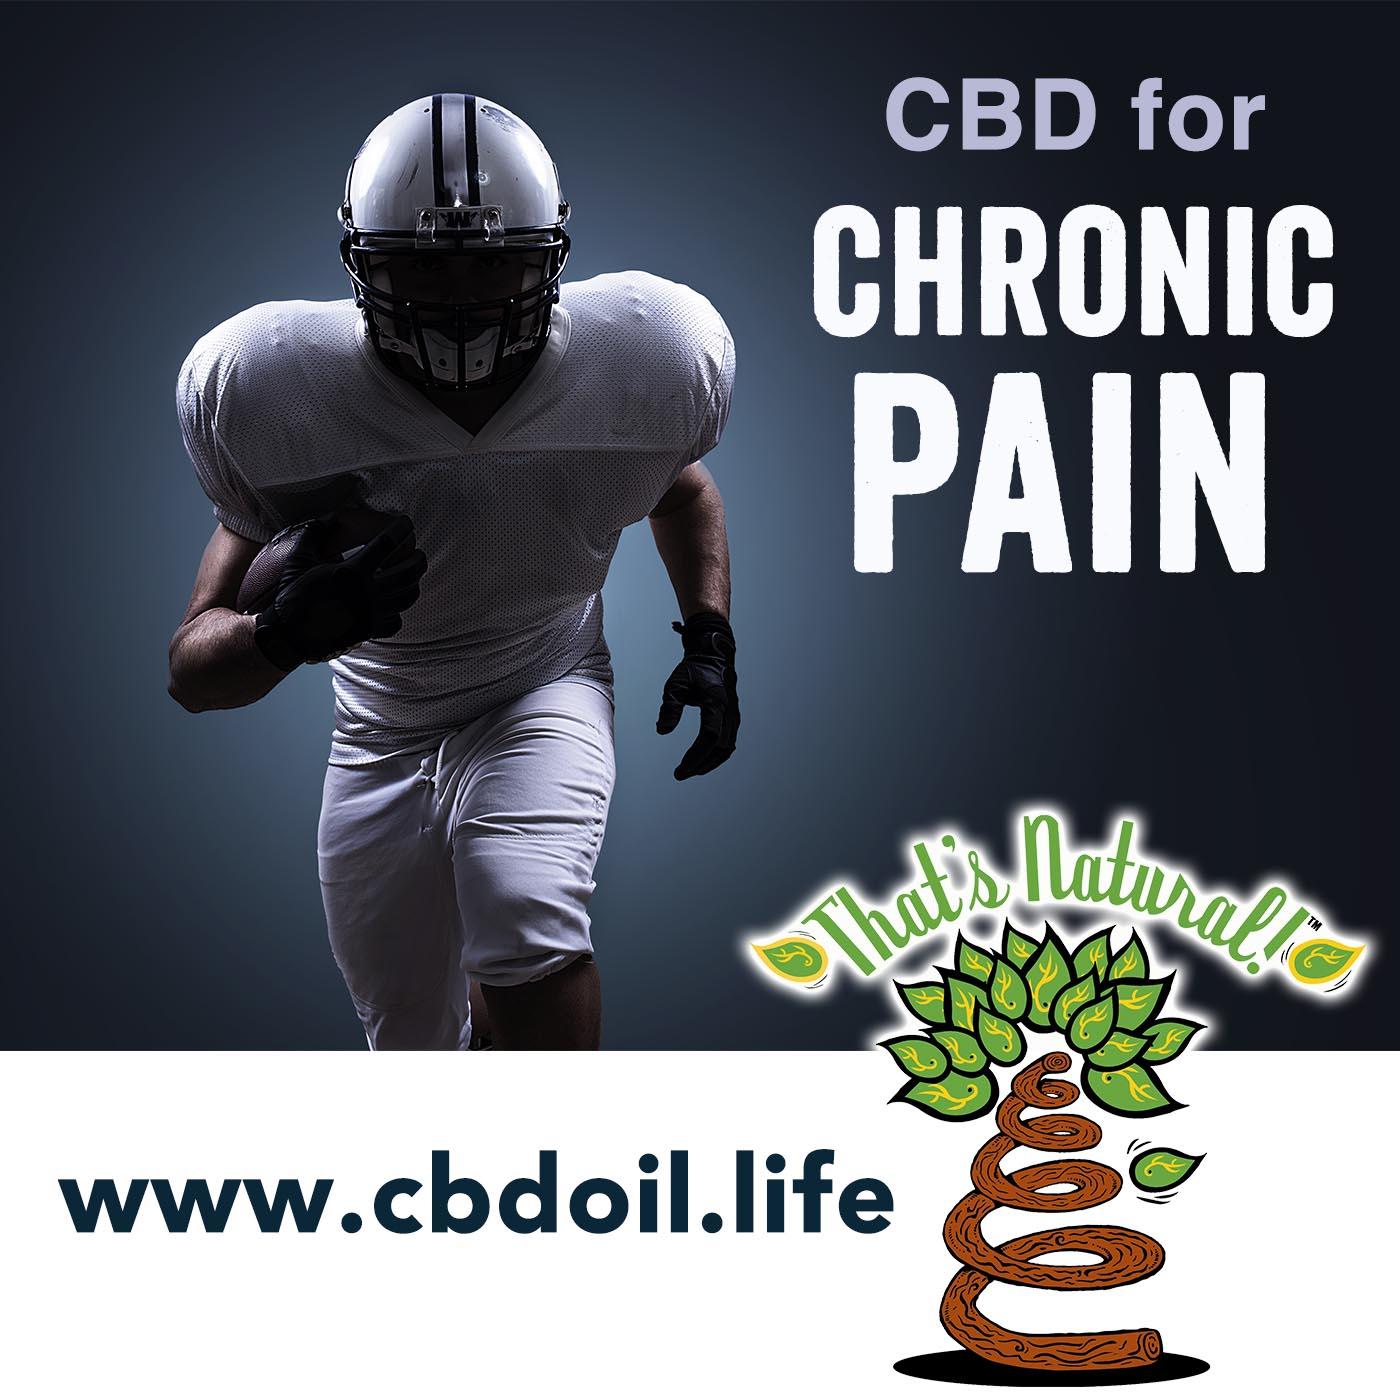 CBD for Chronic Pain from That's Natural, Football Player Running V1